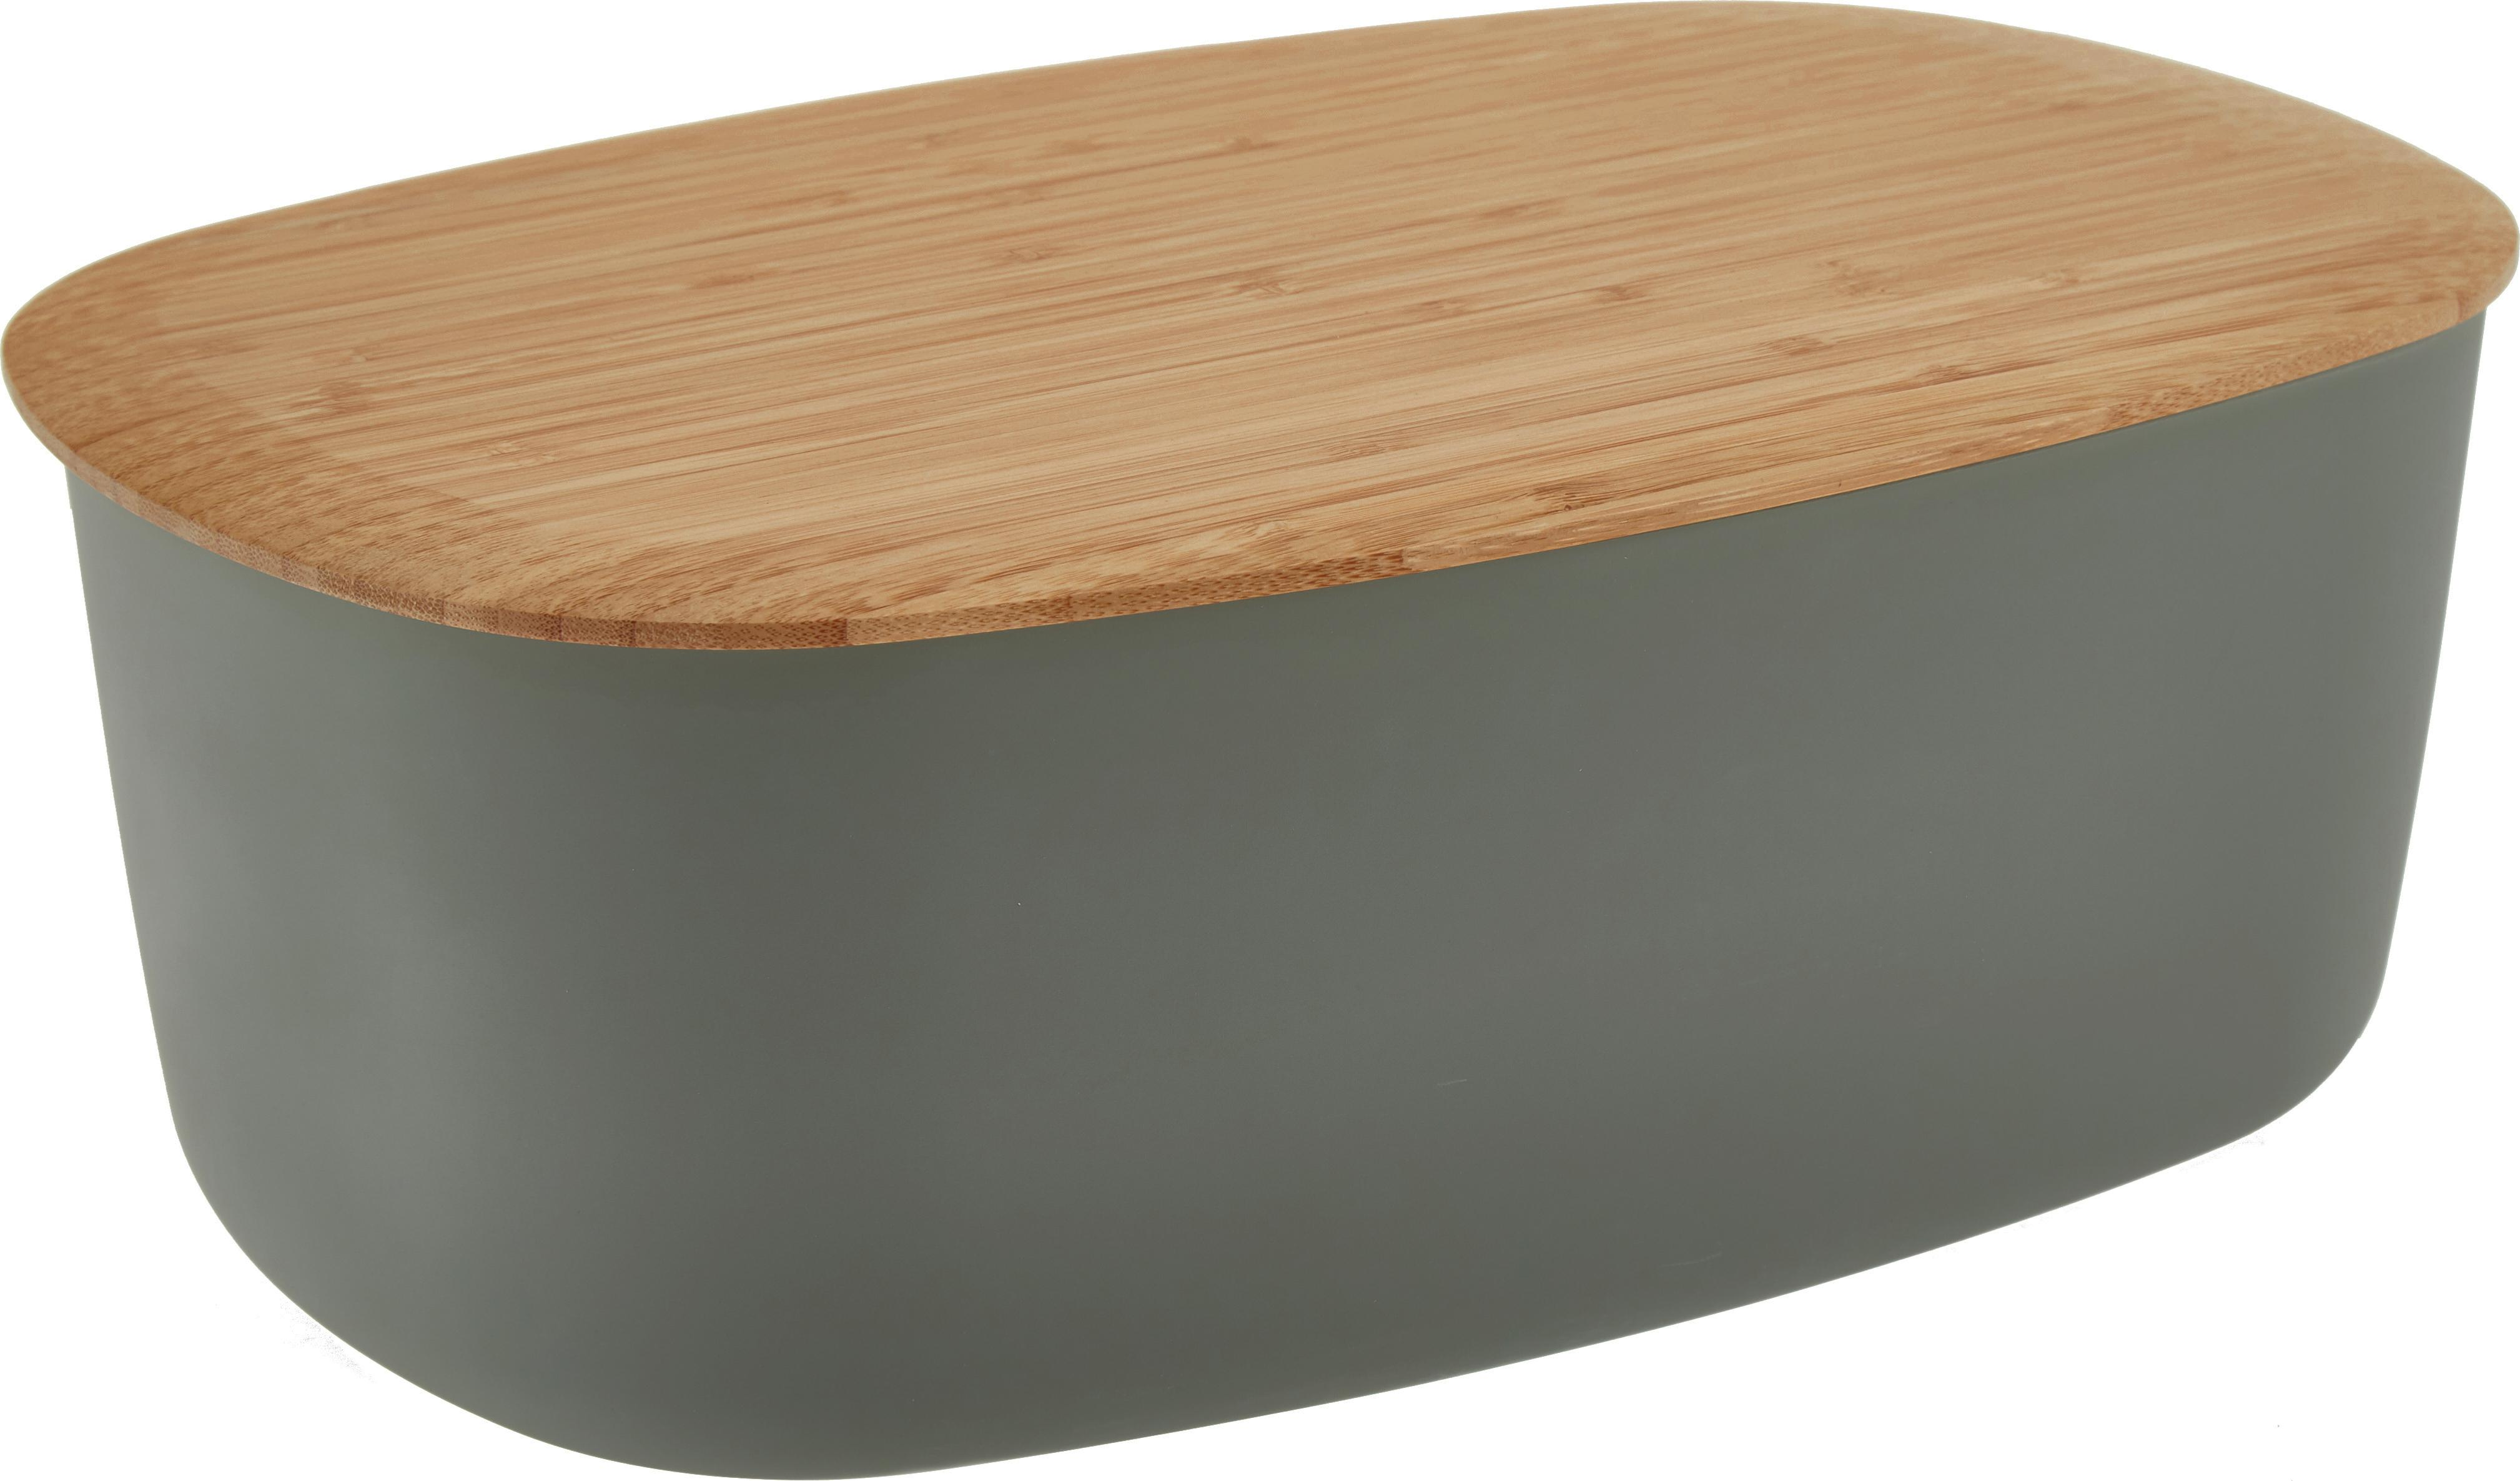 Broodtrommel Box-It, Doos: Melamine, Deksel: Bamboe, Doos: Grijs<br>Deksel: Bruin, 35 x 12 cm